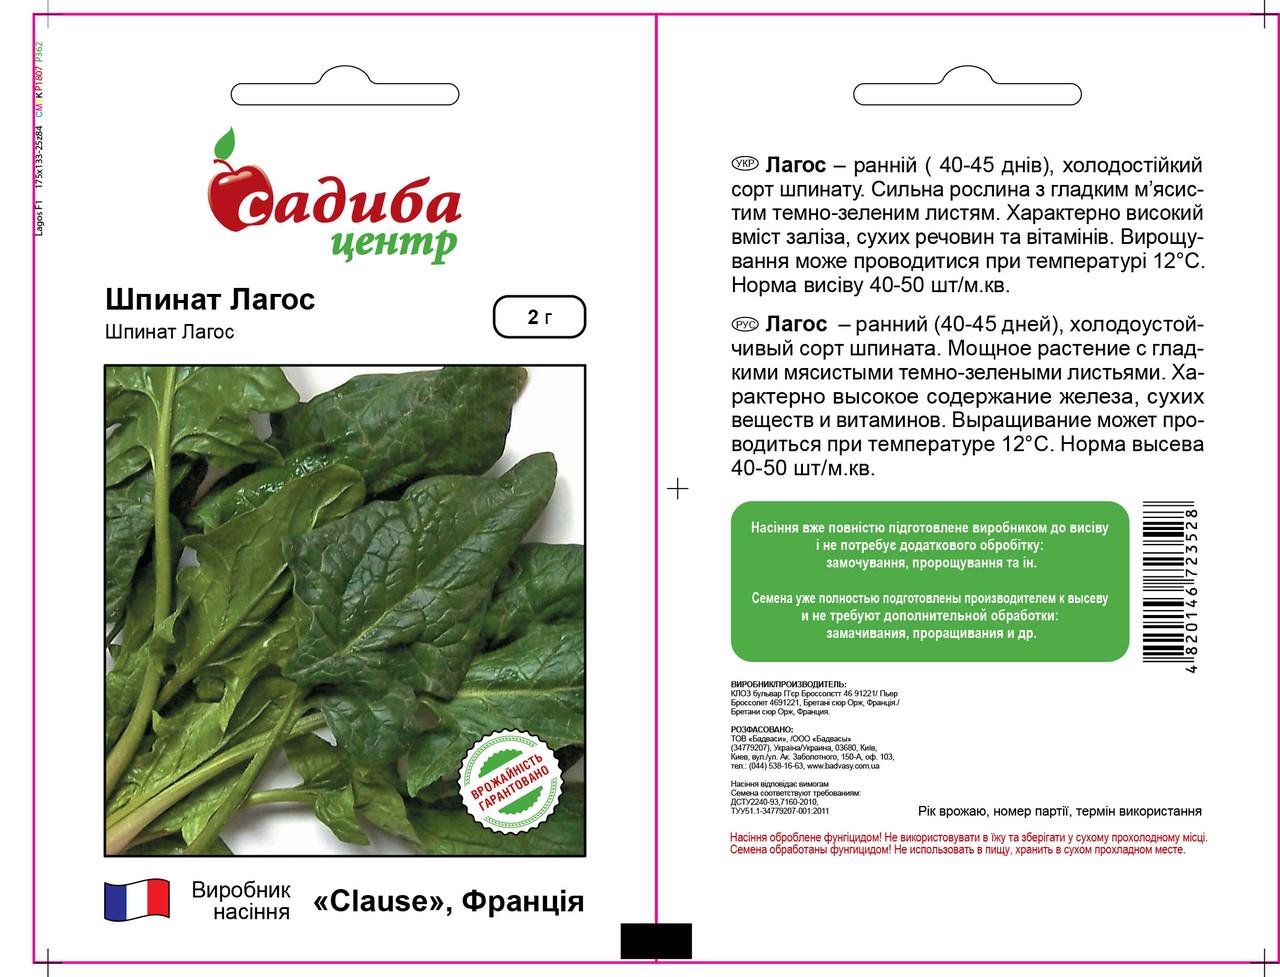 Семена шпината Лагос (Clause / САДЫБА ЦЕНТР) 2 г — ранний (40-45 дн), холодоустойчивый